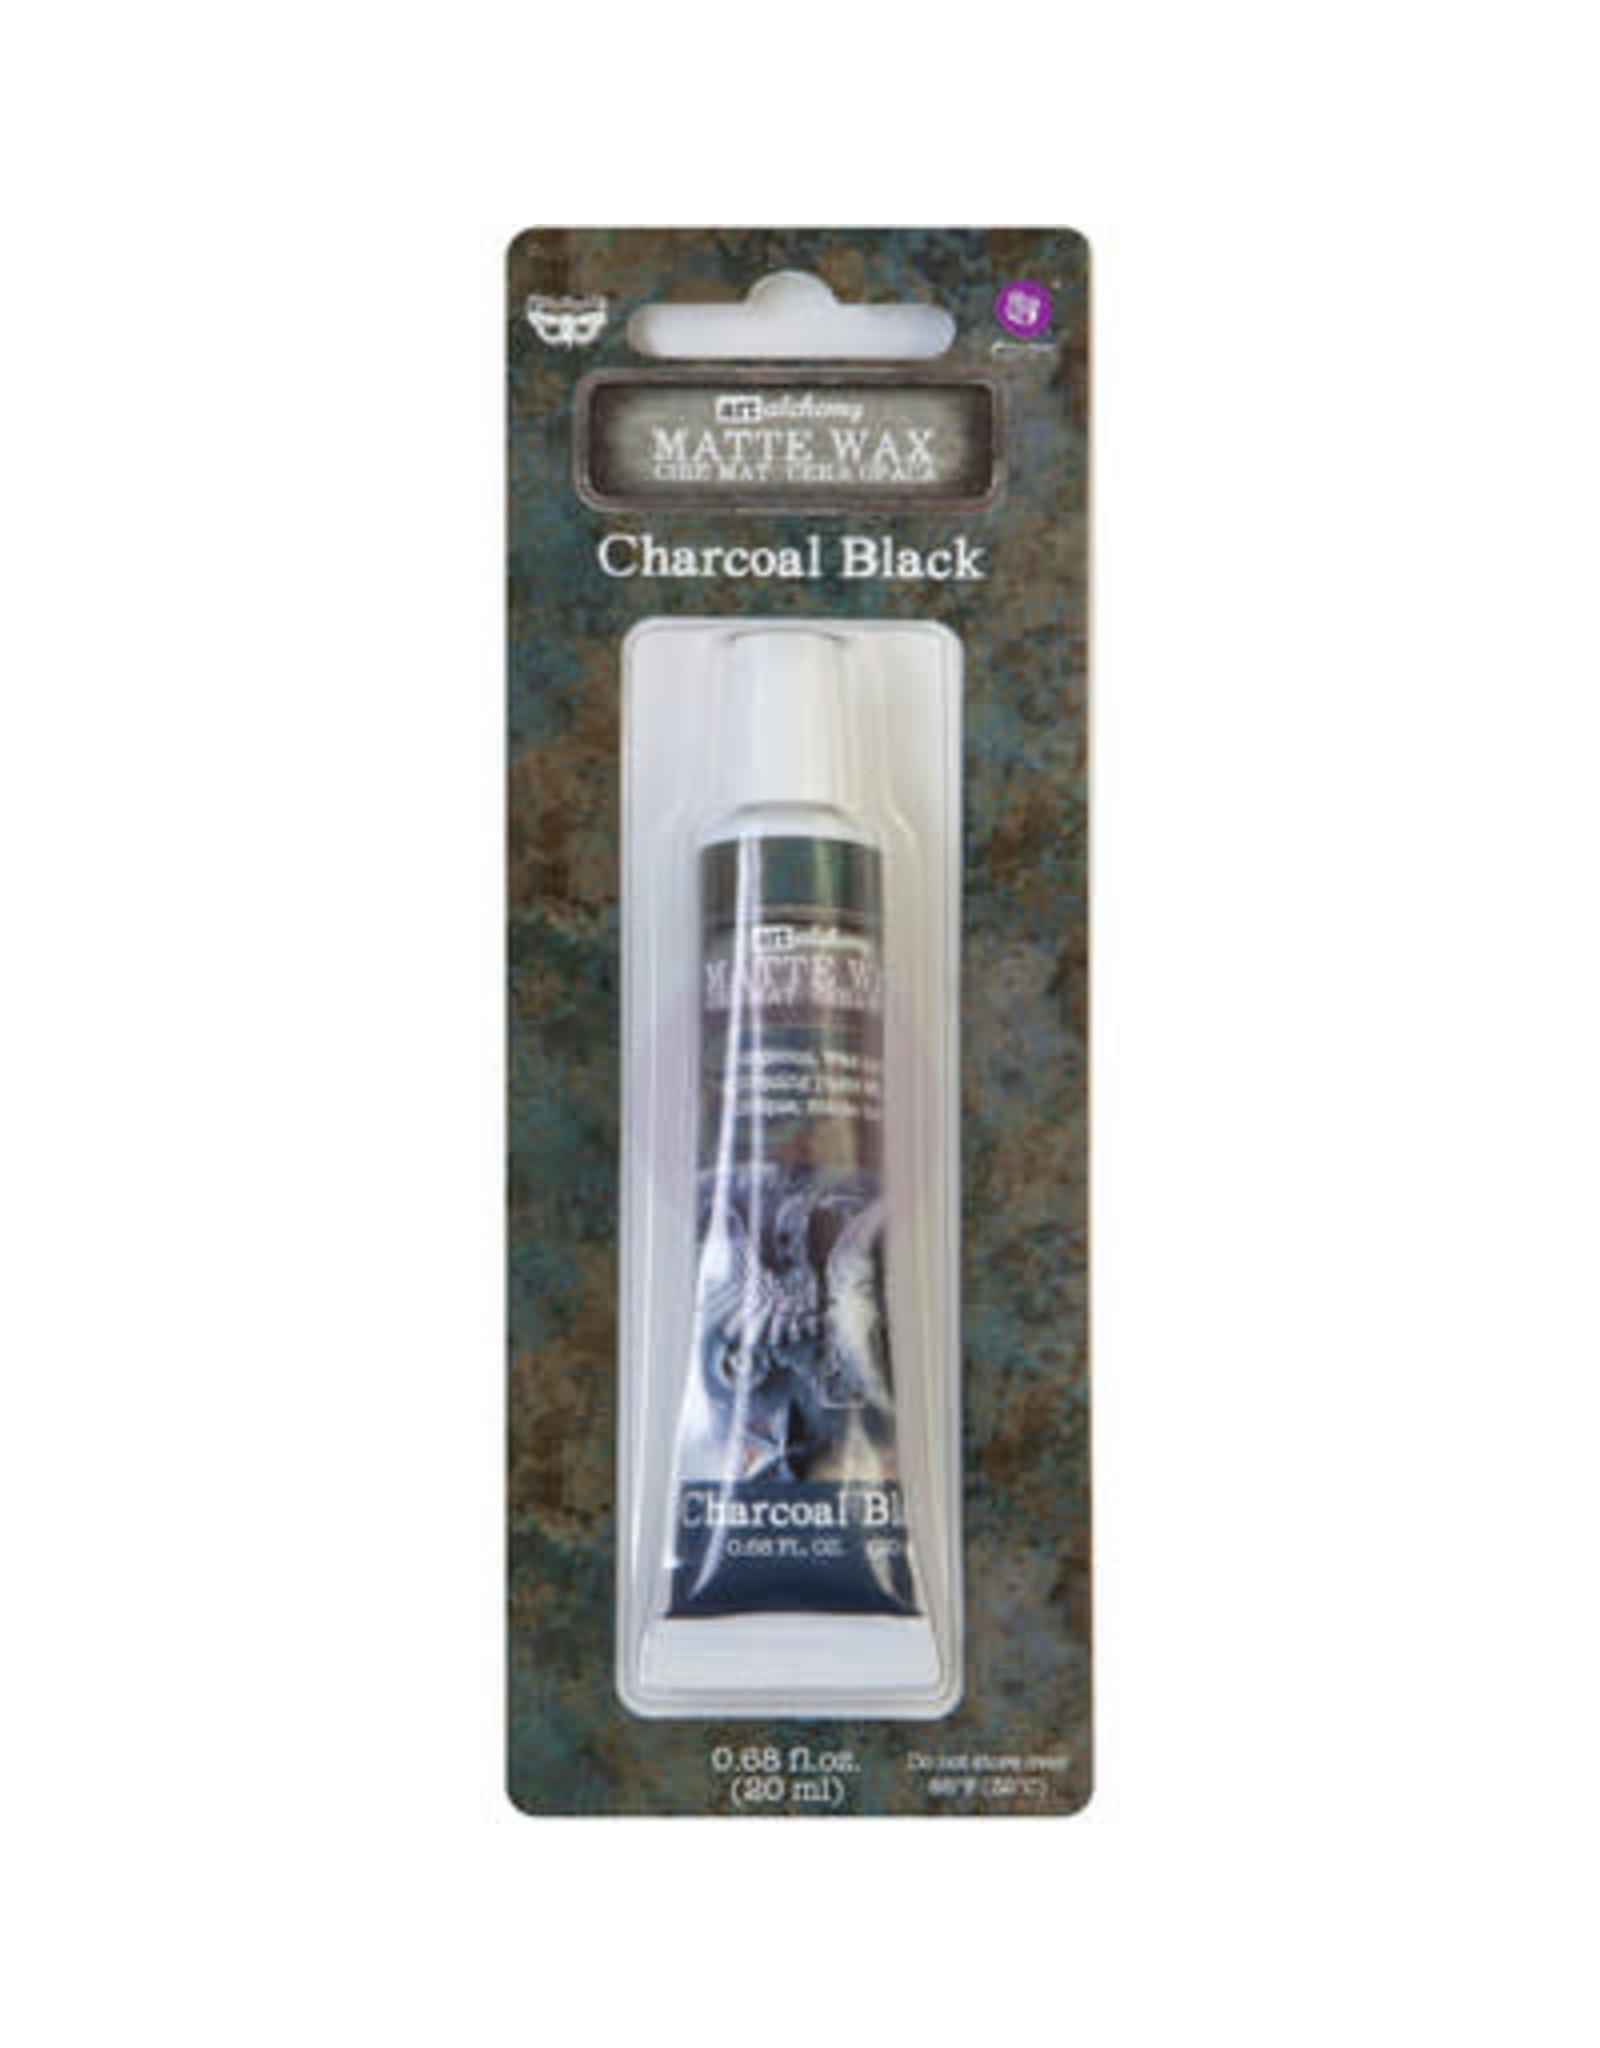 PRIMA MARKETING INC Art Alchemy Matte Wax Paste, Charcoal Black